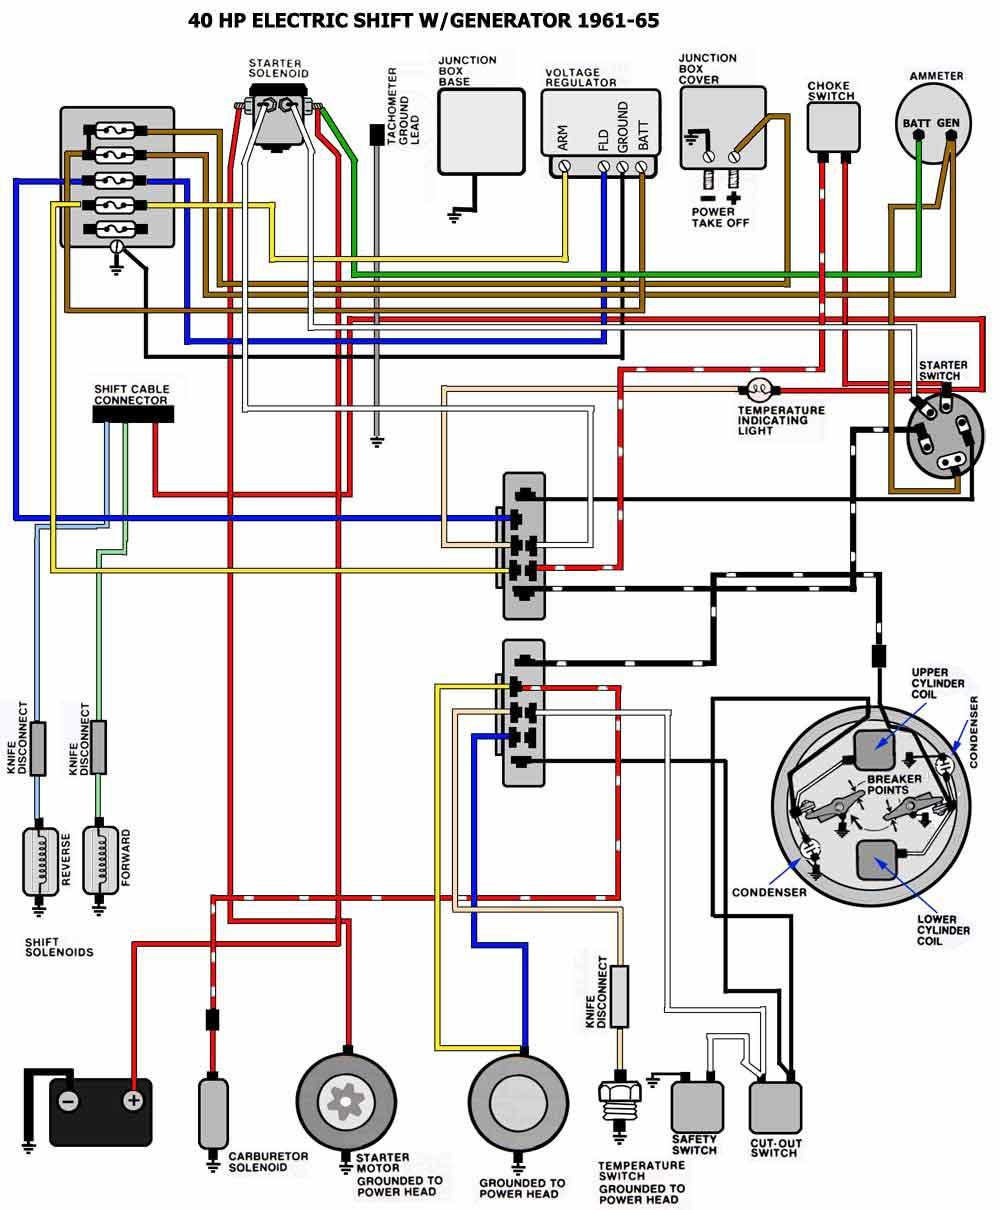 61_66_40HP?resize=806%2C975 outboard motor wiring motorssite org